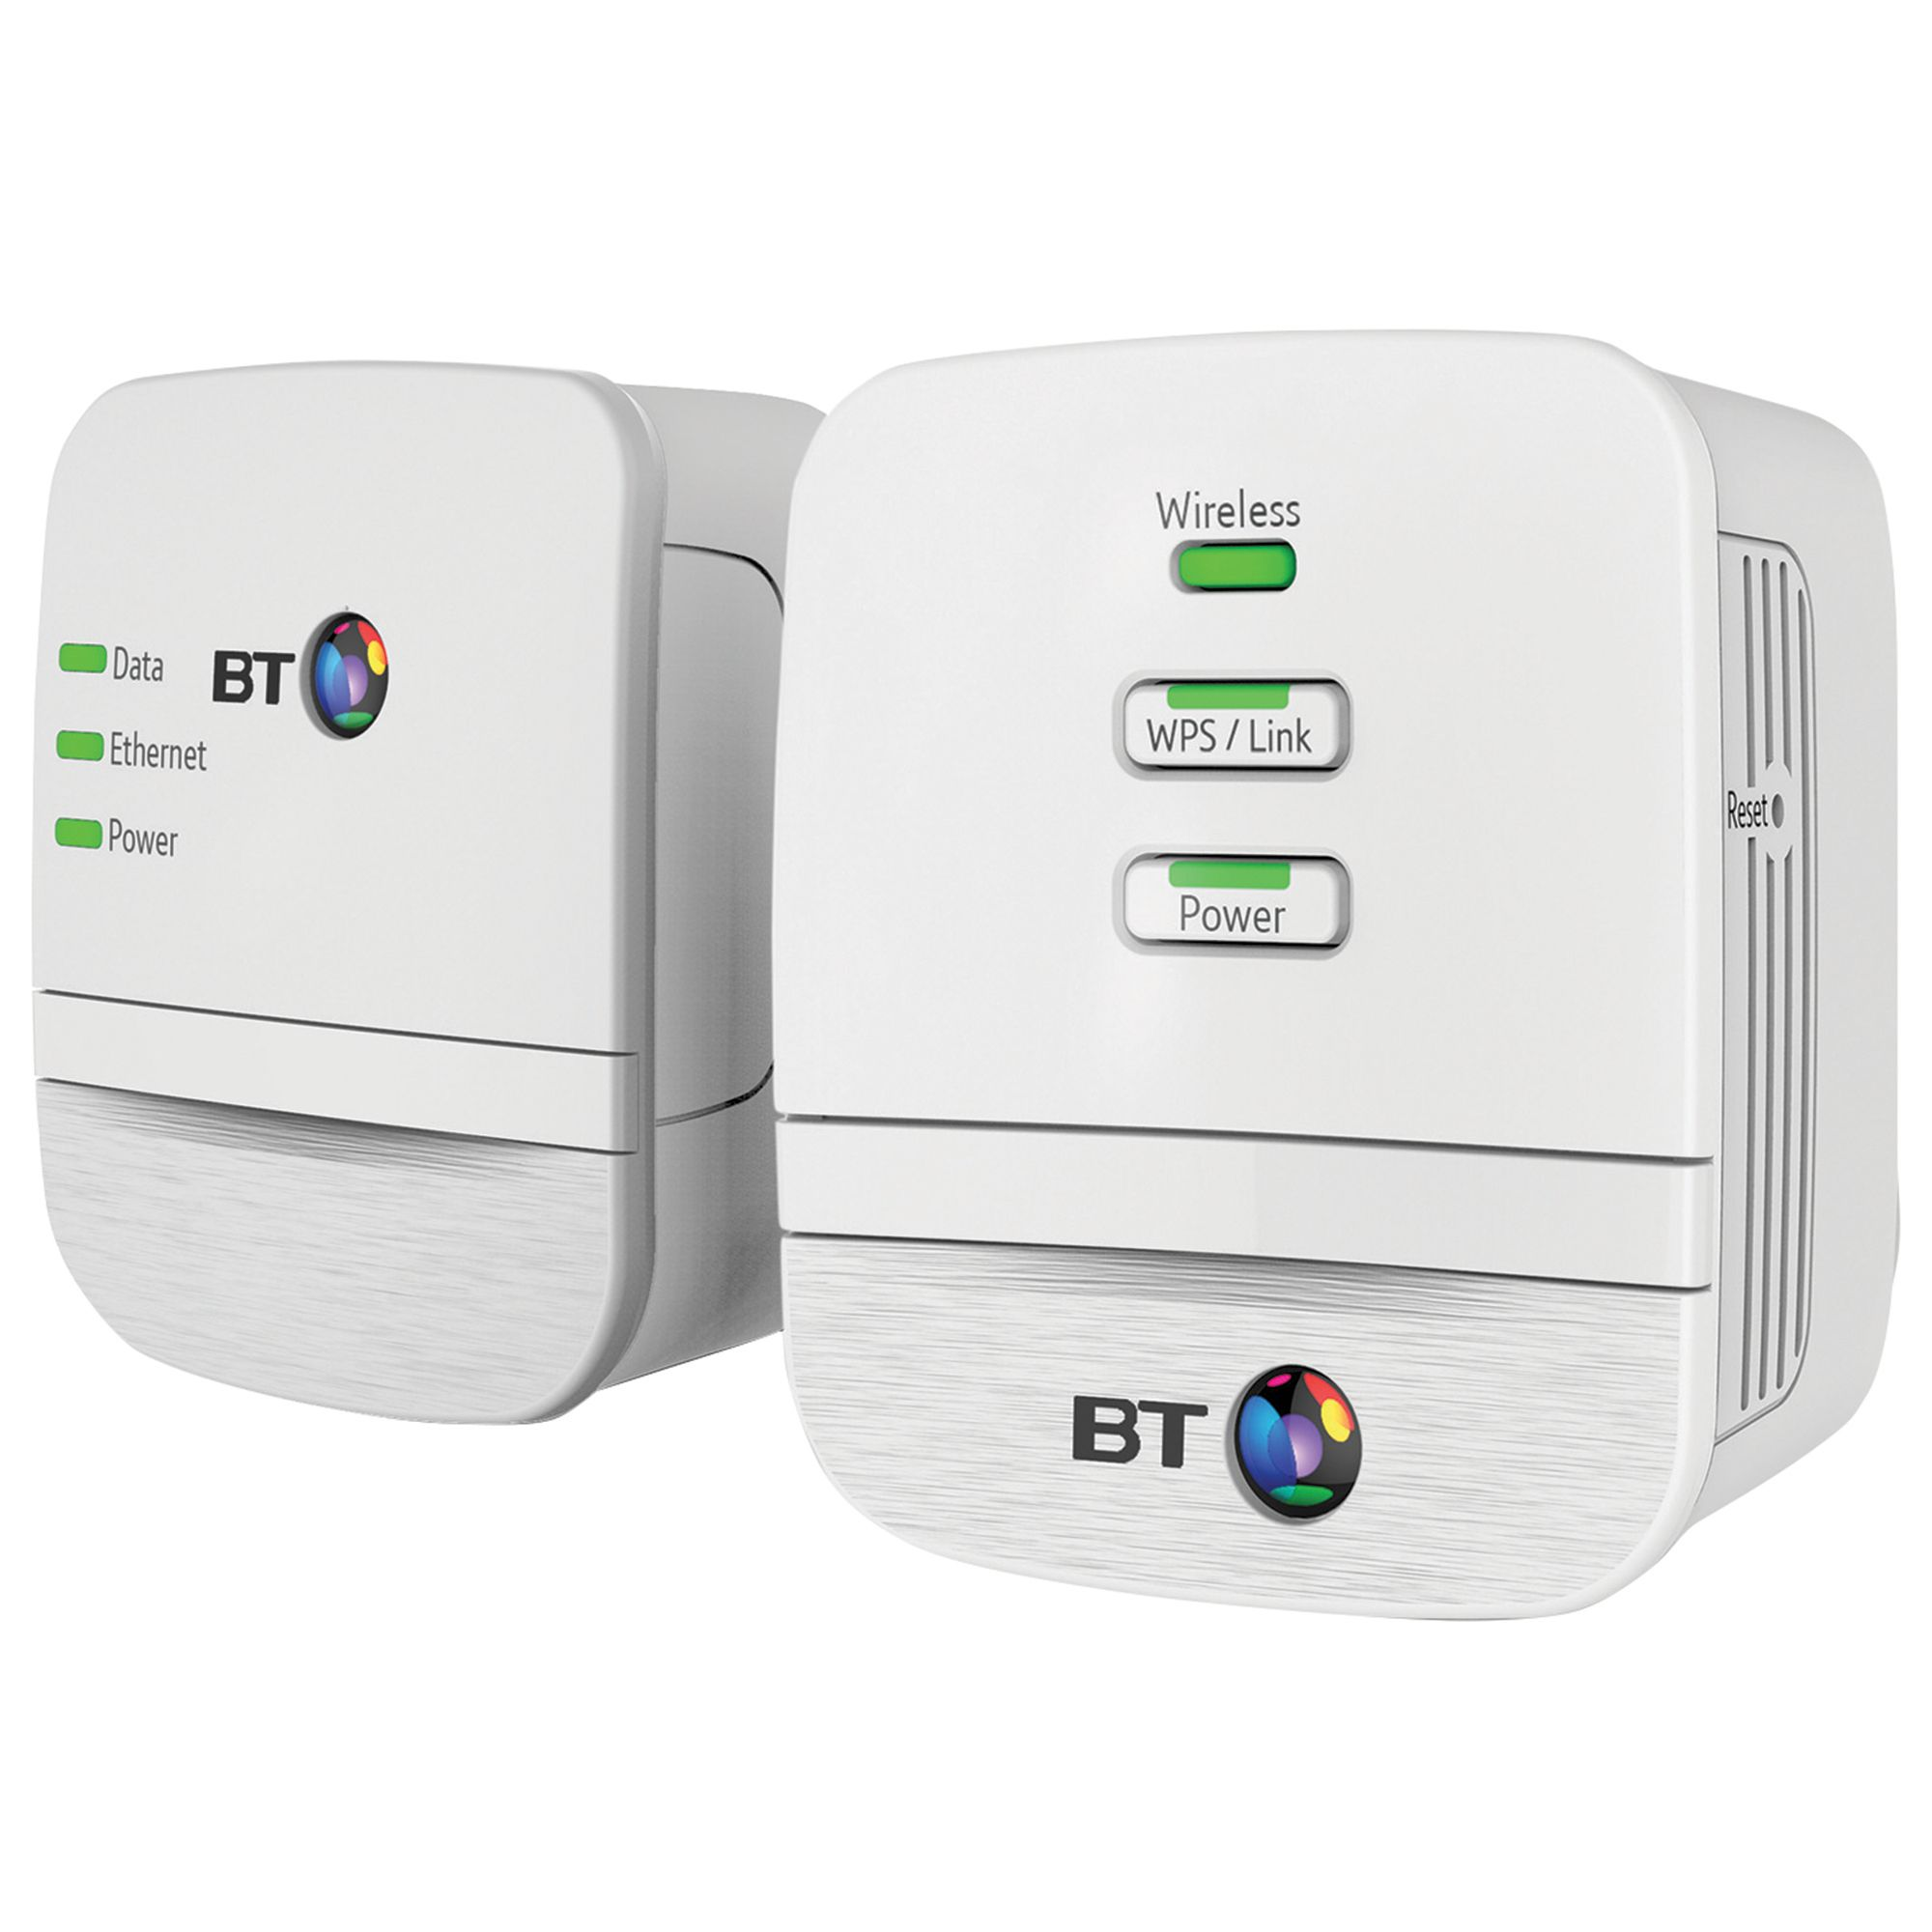 TP Link Wi-Fi Extender AC750 | Departments | DIY at B&Q